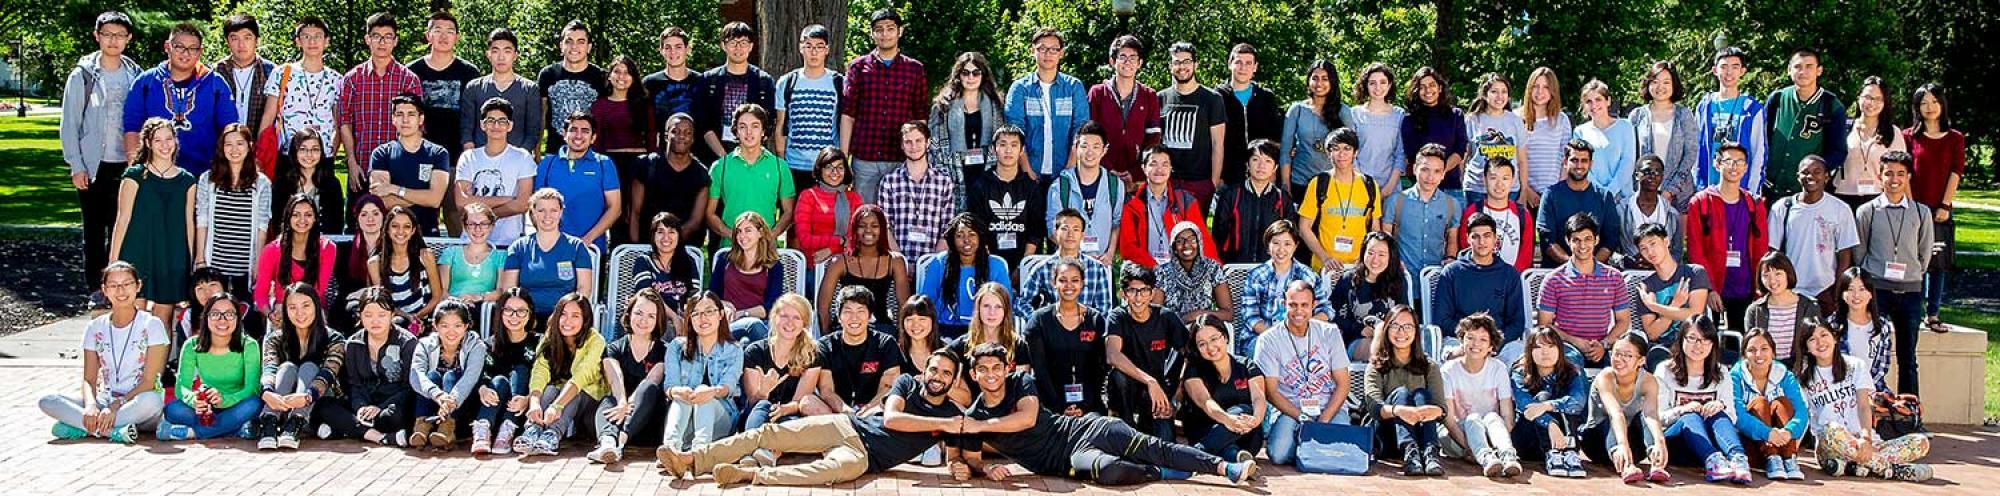 2015 International Pre-Orientation Program